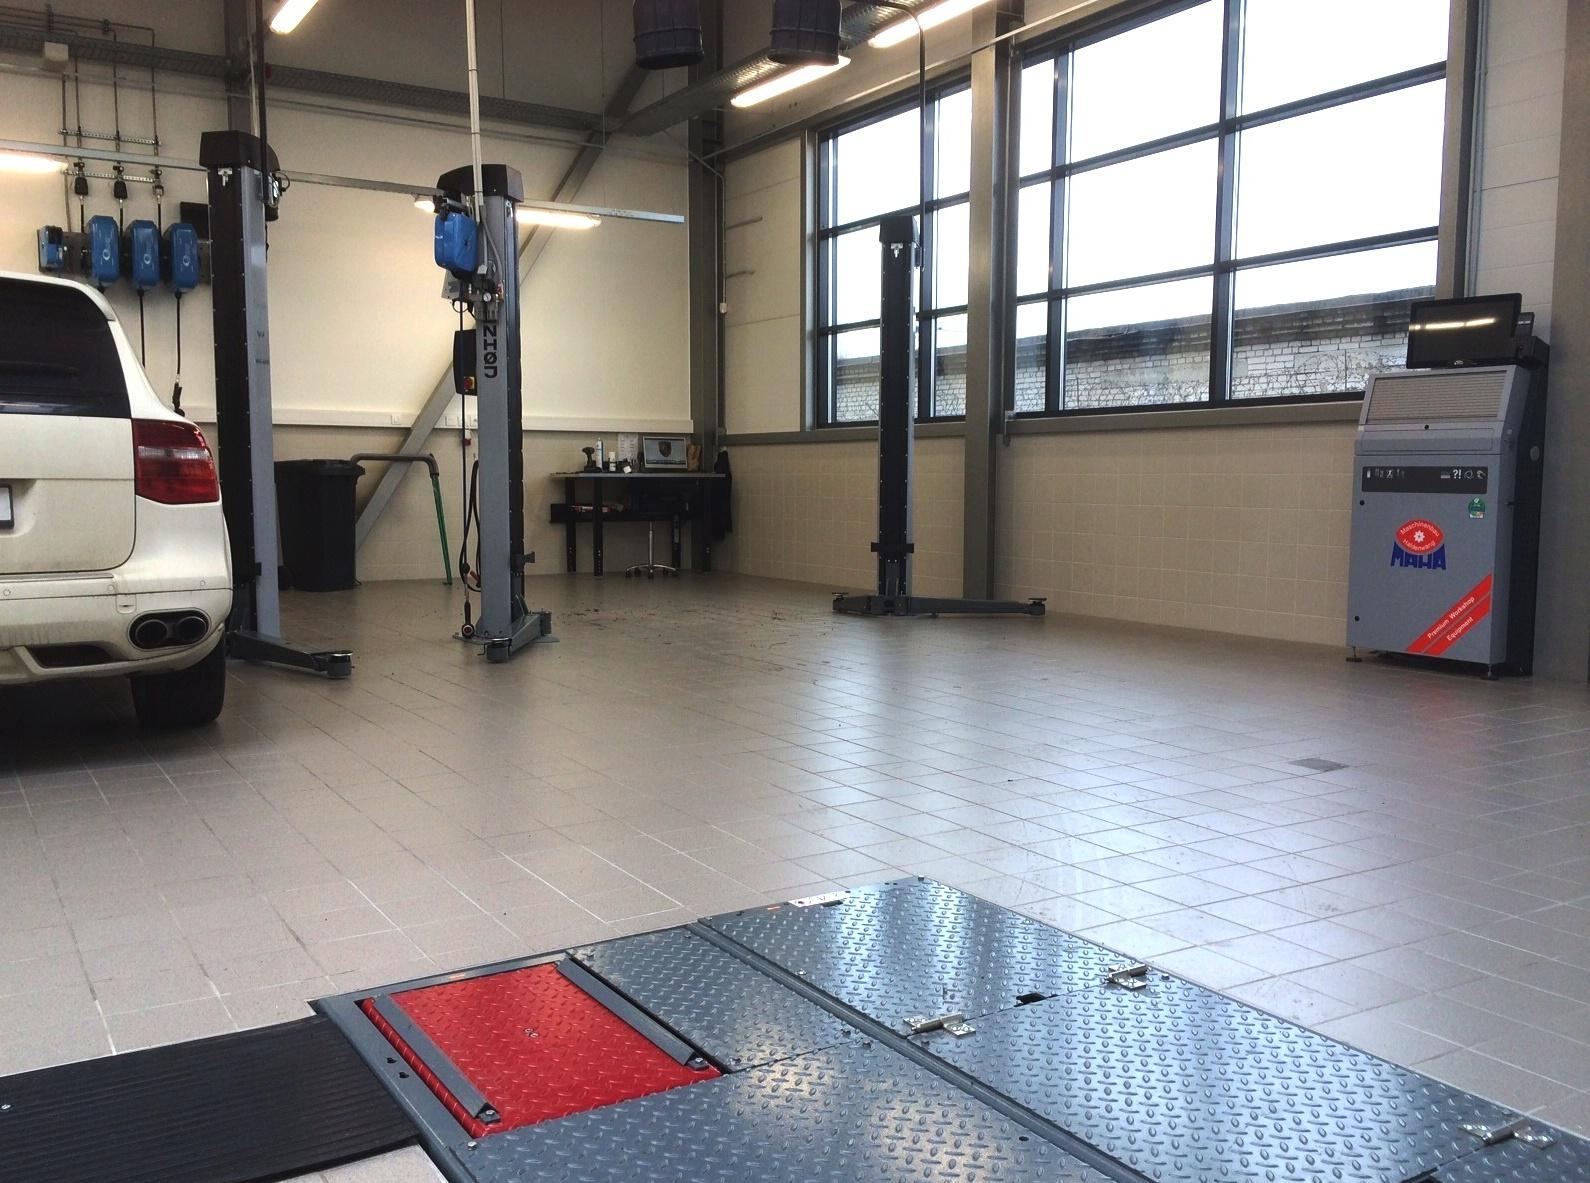 Porsche Tallinn- Stenhoj and MAHA products